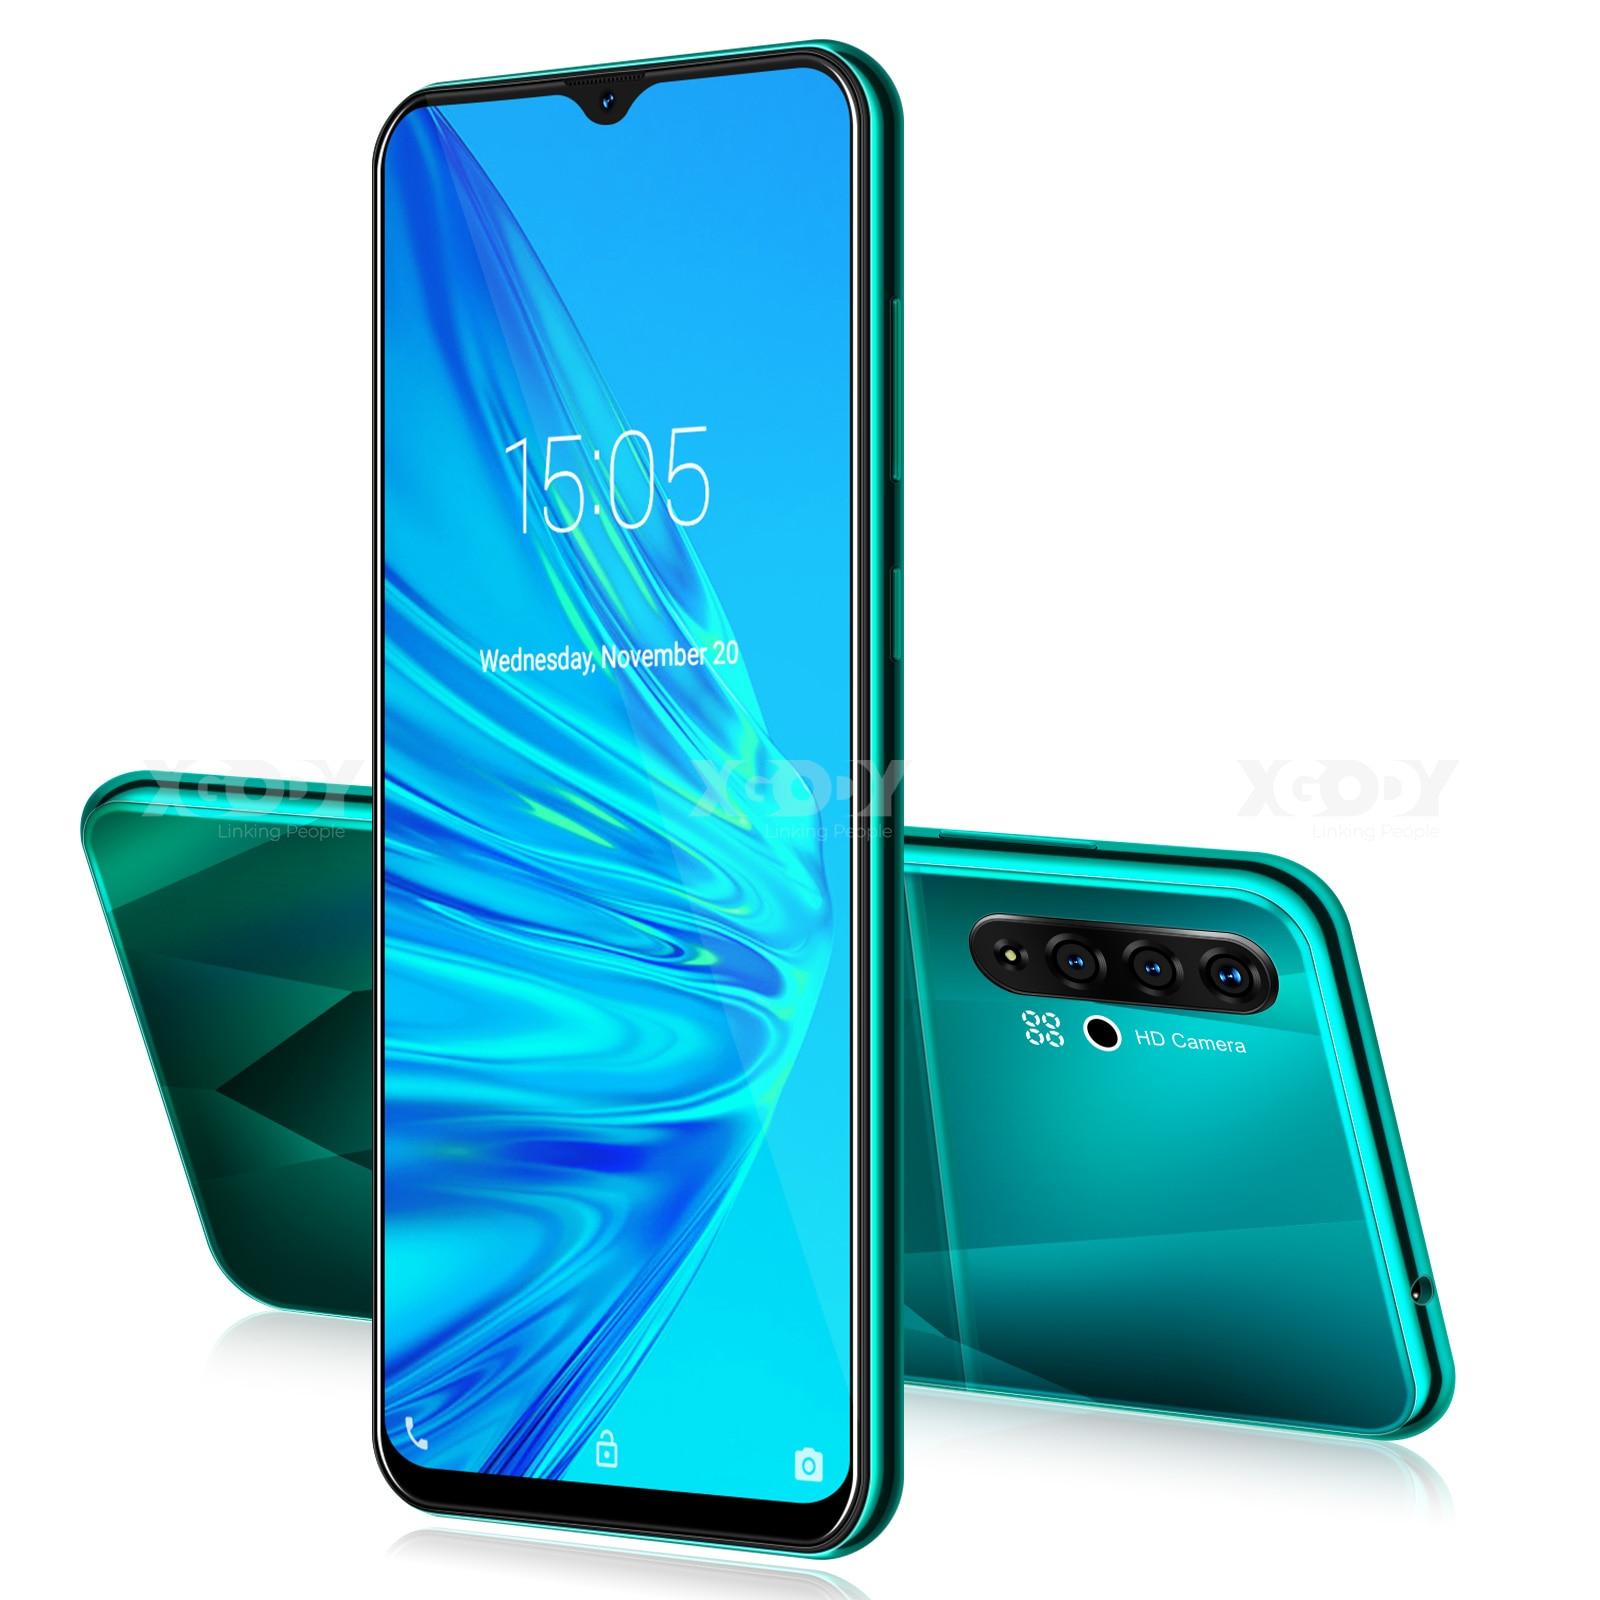 "XGODY A50 3G Smartphone 6.5"" 19:9 Android 9.0 1GB RAM 4GB ROM 5MP Camera Quad Core Dual SIM GPS WiFi Mobile Phones CellPhone"